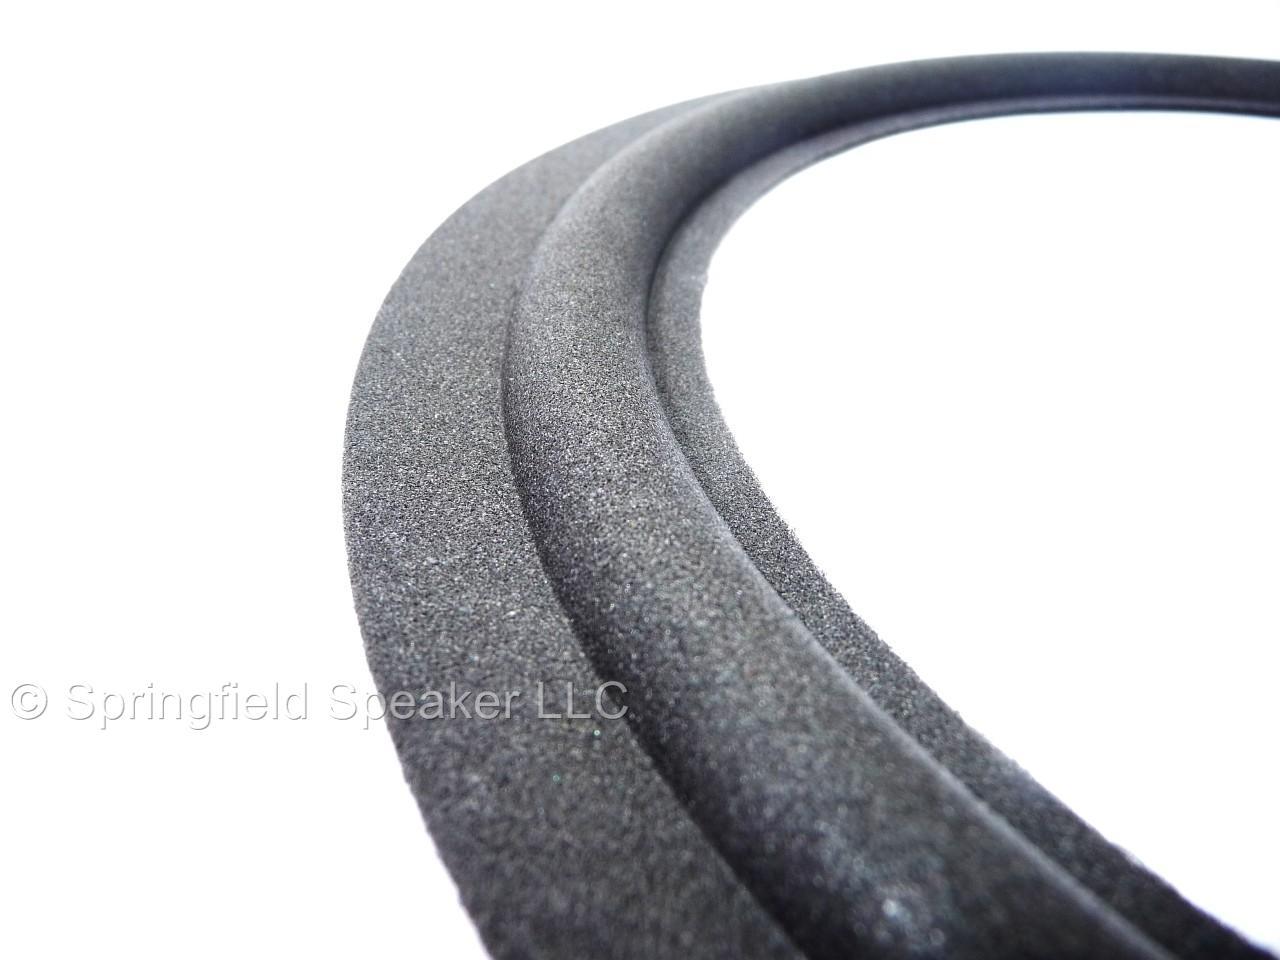 2 Bose 501 Series Ii Speaker Foam Surround Repair Kit